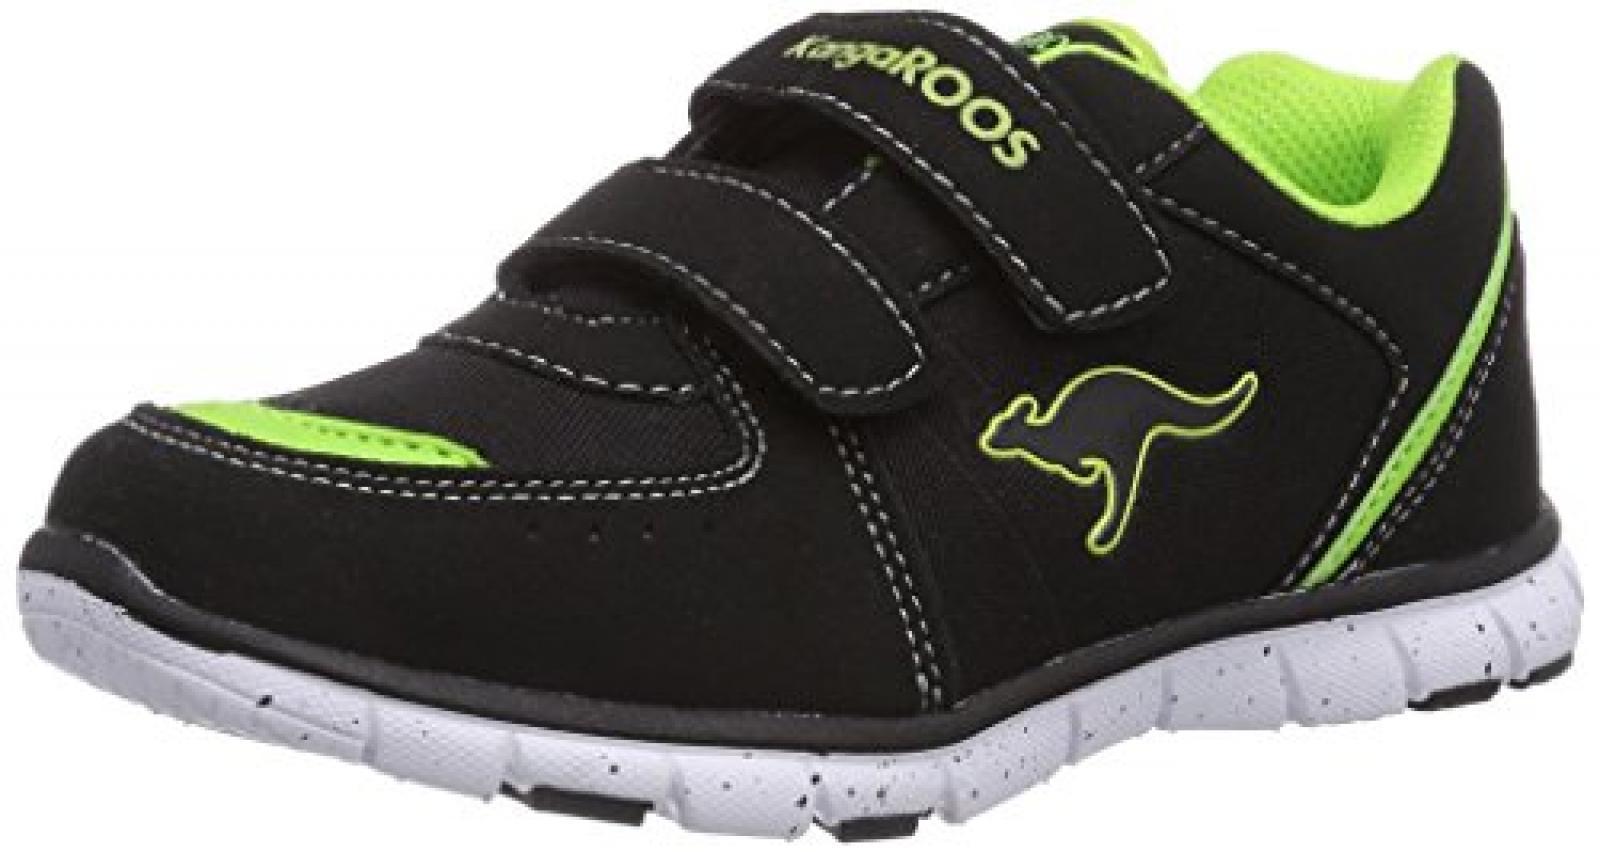 KangaROOS BlueRun 303 Unisex-Kinder Sneakers